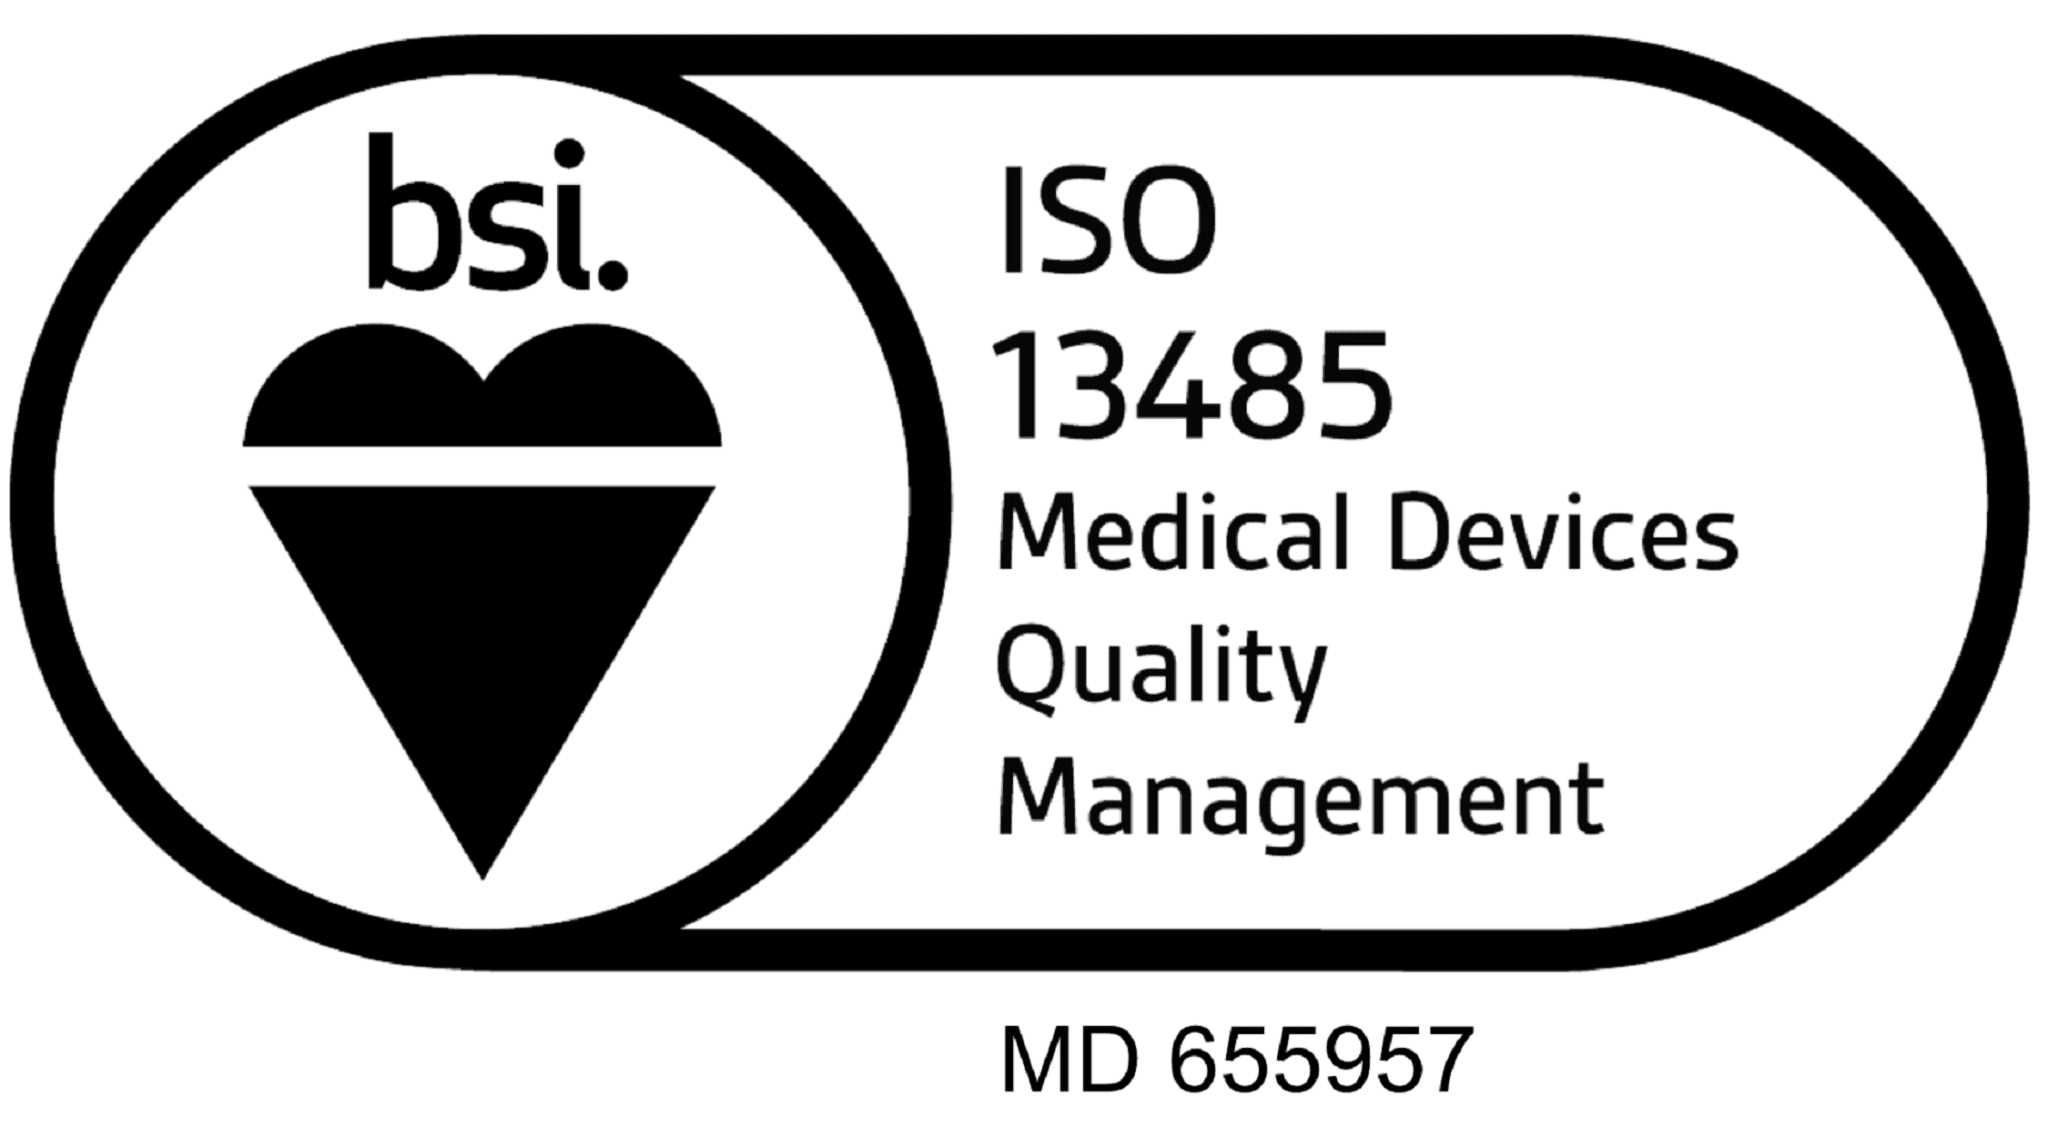 Evac+Chair International achieves highest quality standard